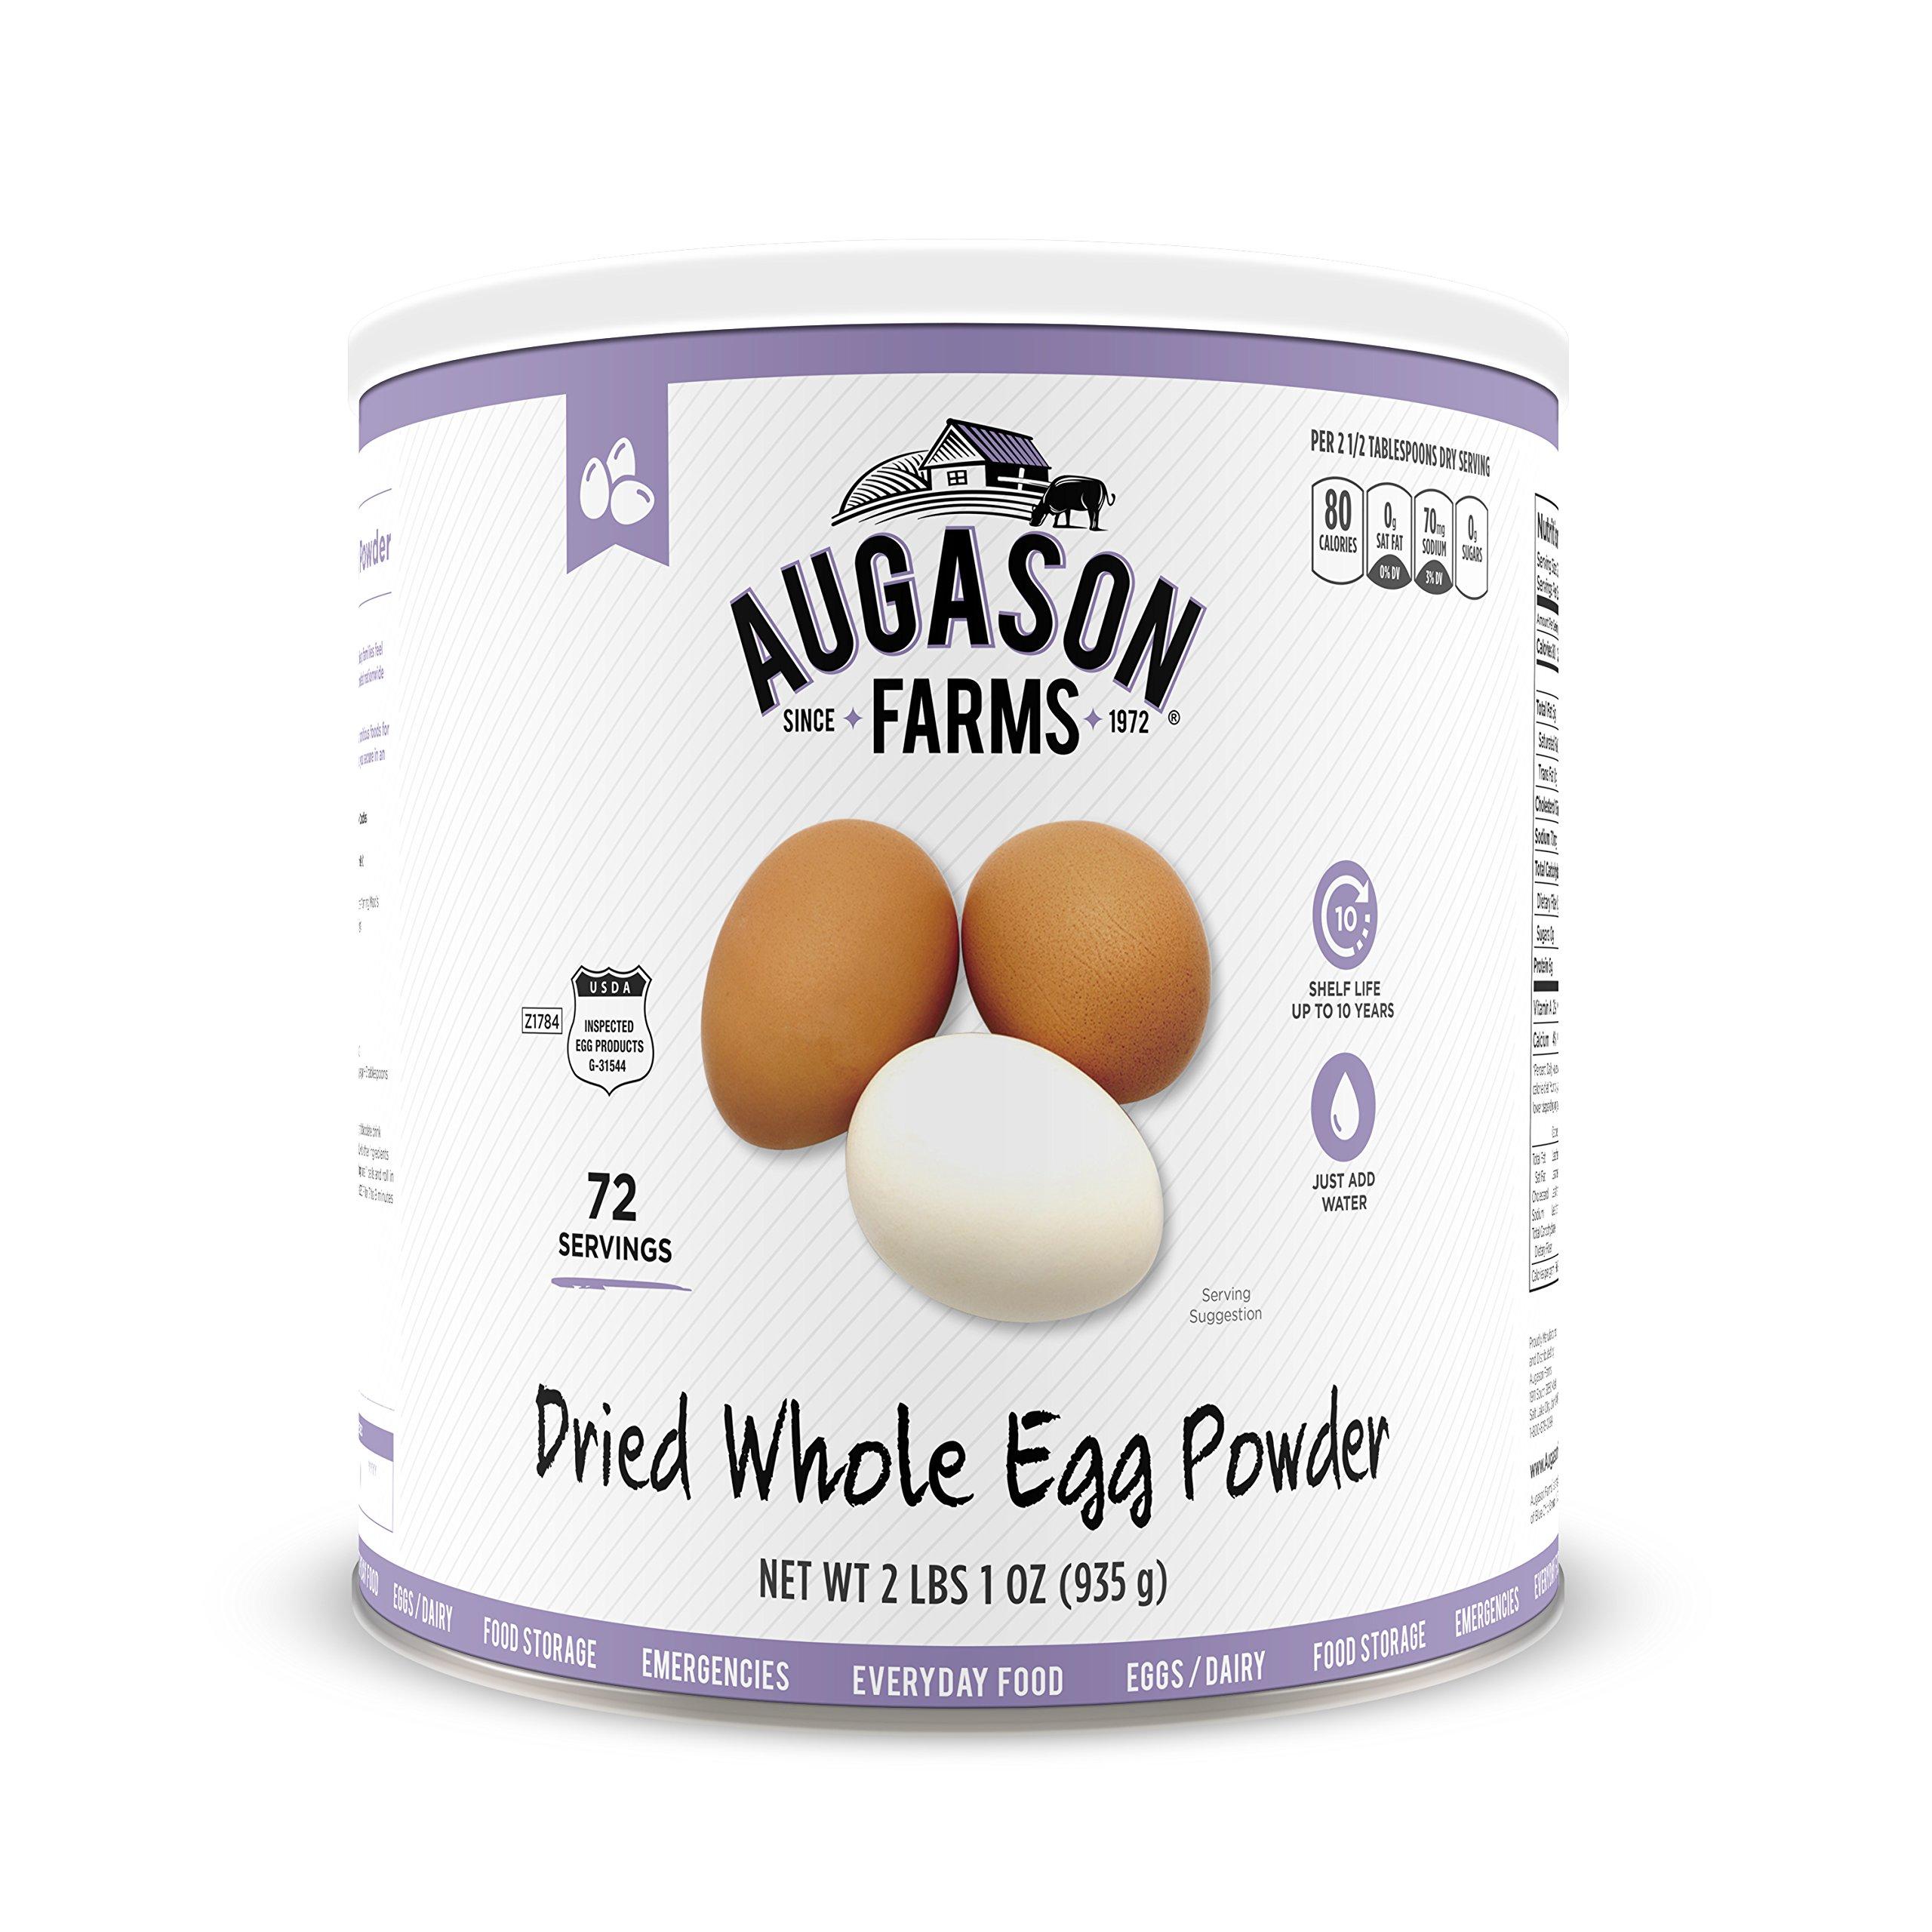 Augason Farms Dried Whole Egg Product 2 lbs 1 oz No. 10 Can by Augason Farms (Image #1)